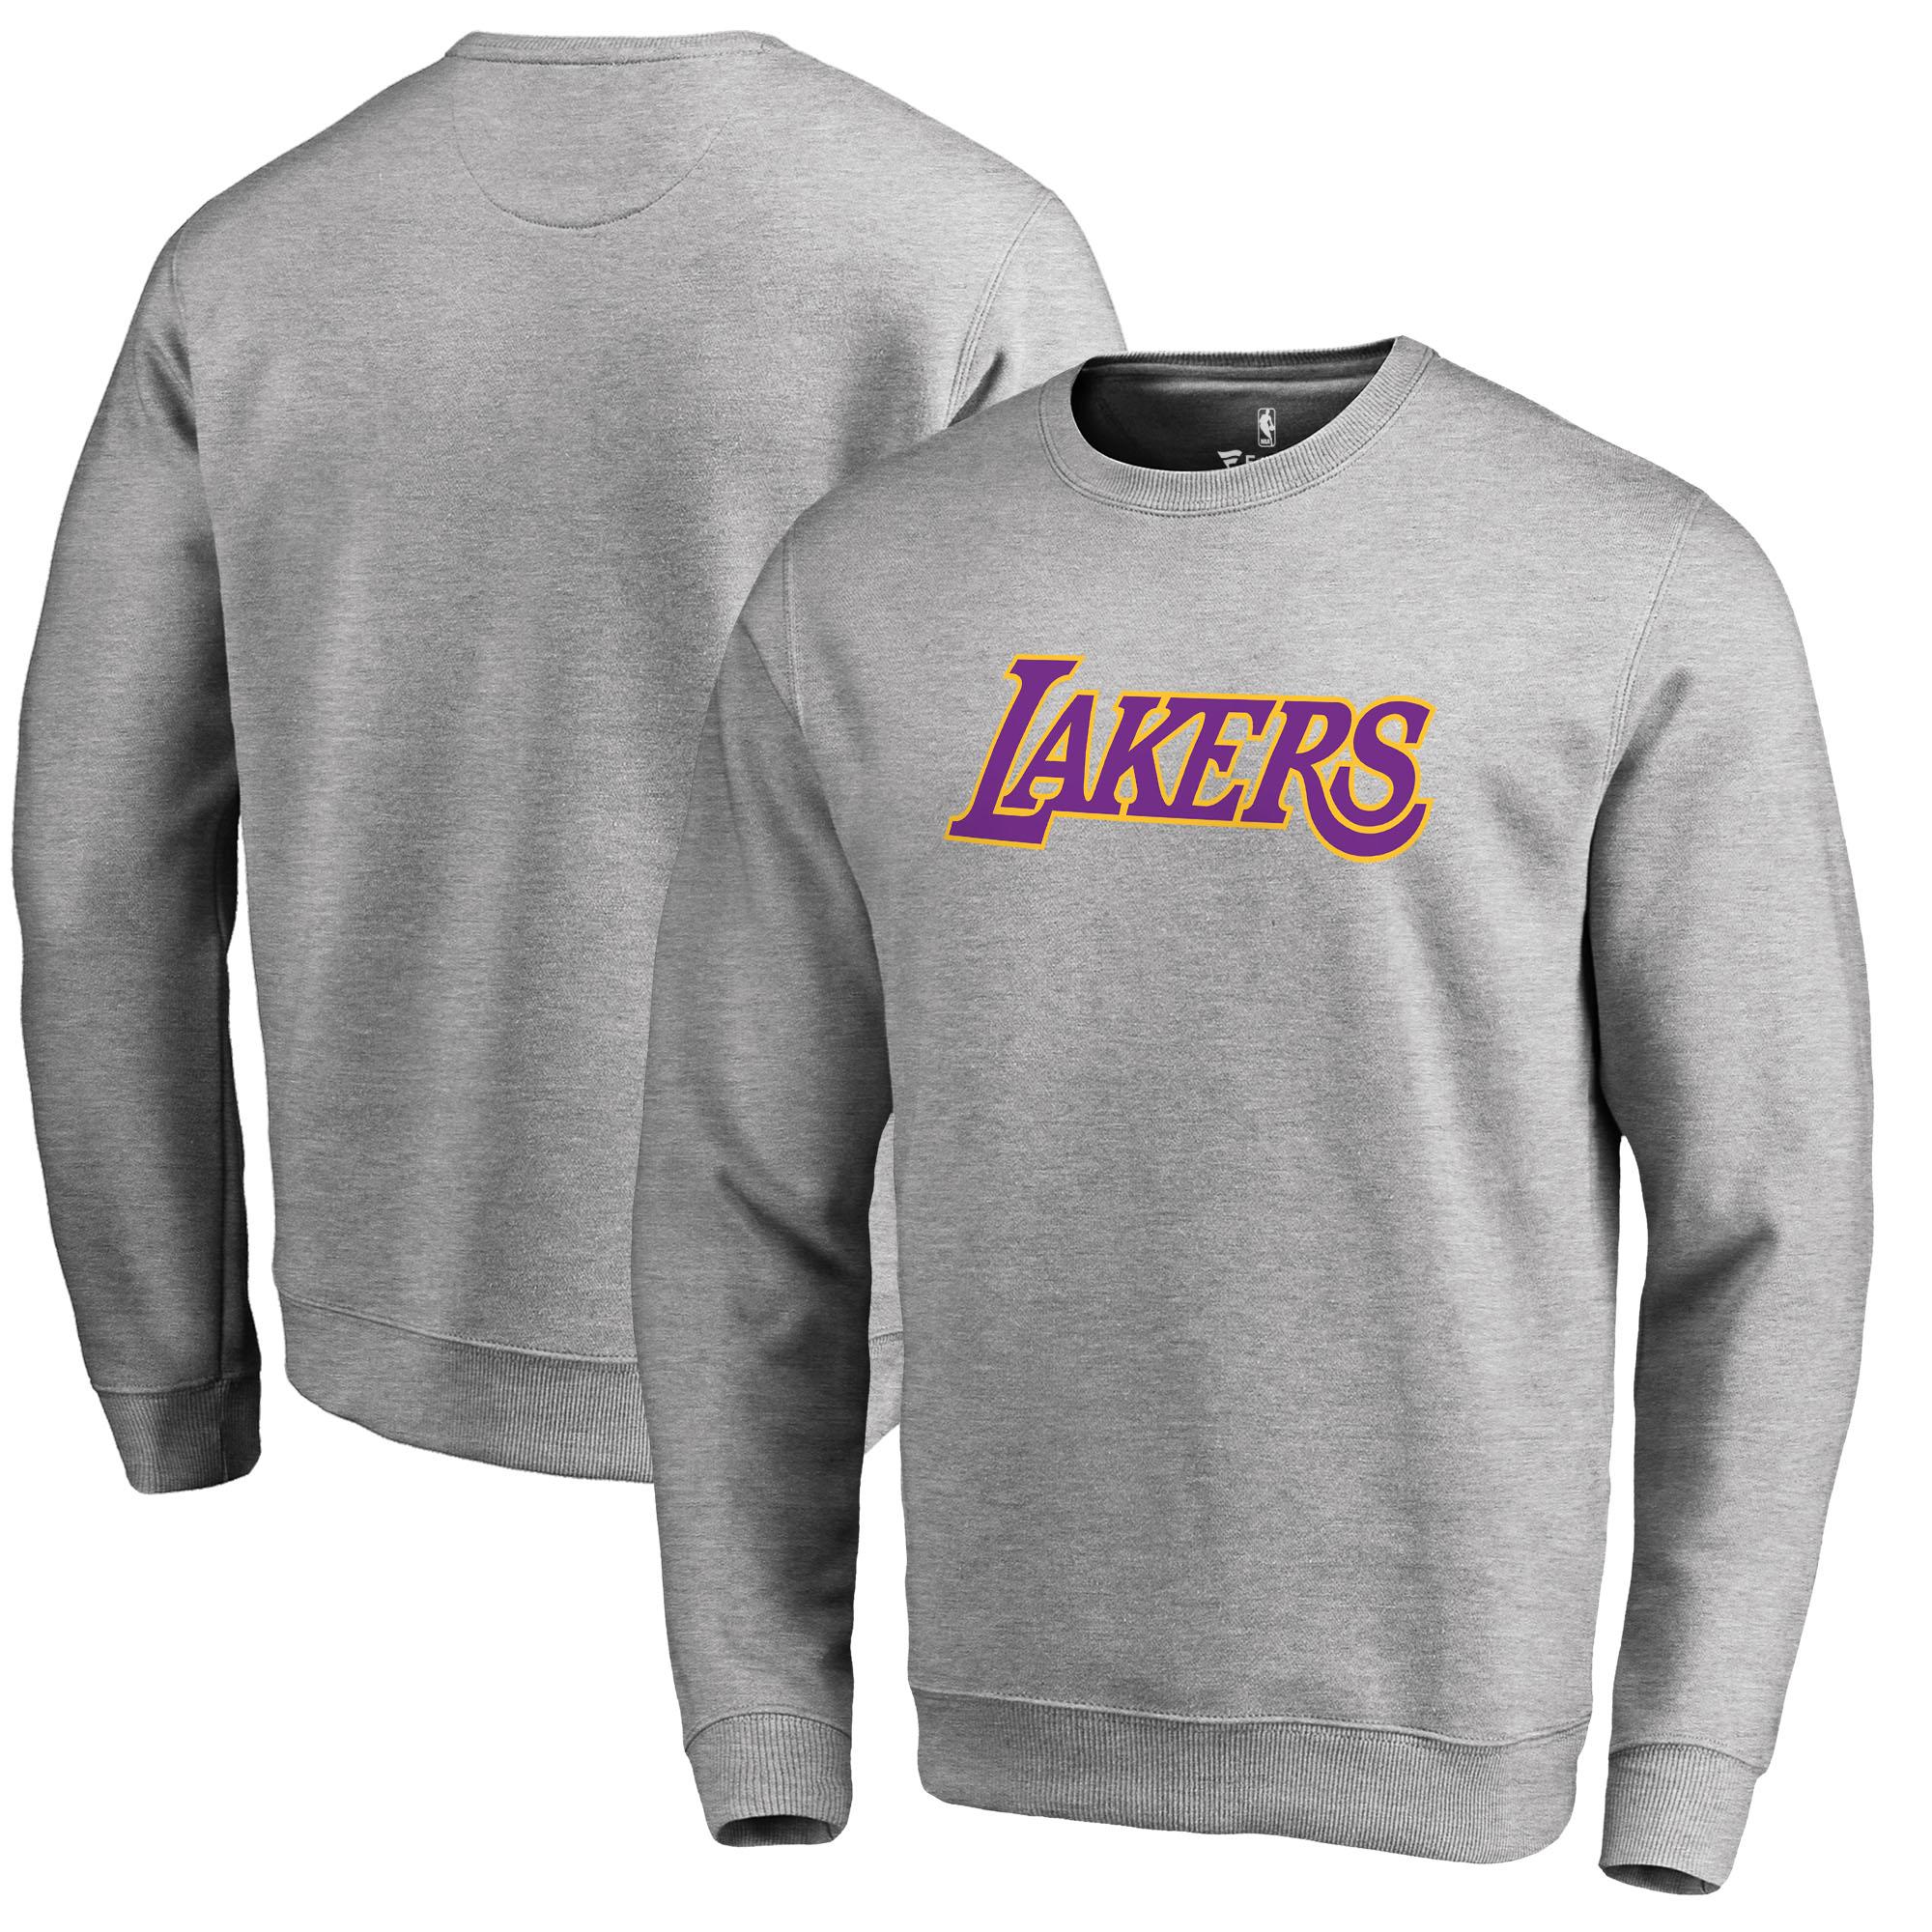 Los Angeles Lakers Fanatics Branded Wordmark Pullover Sweatshirt - Heathered Gray